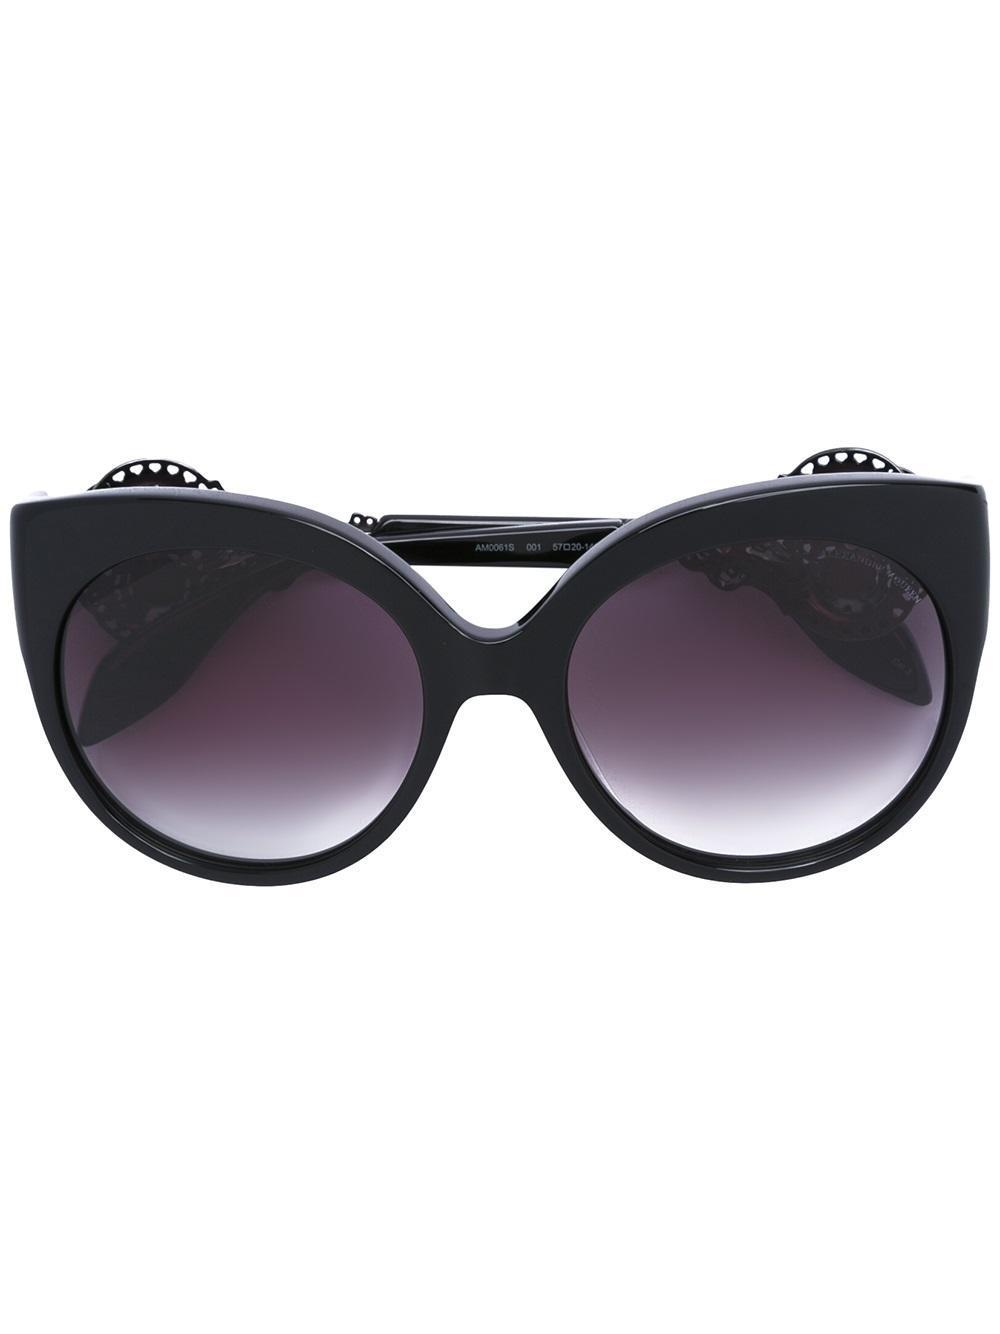 Alexander Mcqueen Embellished Cat Eye Sunglasses In Black